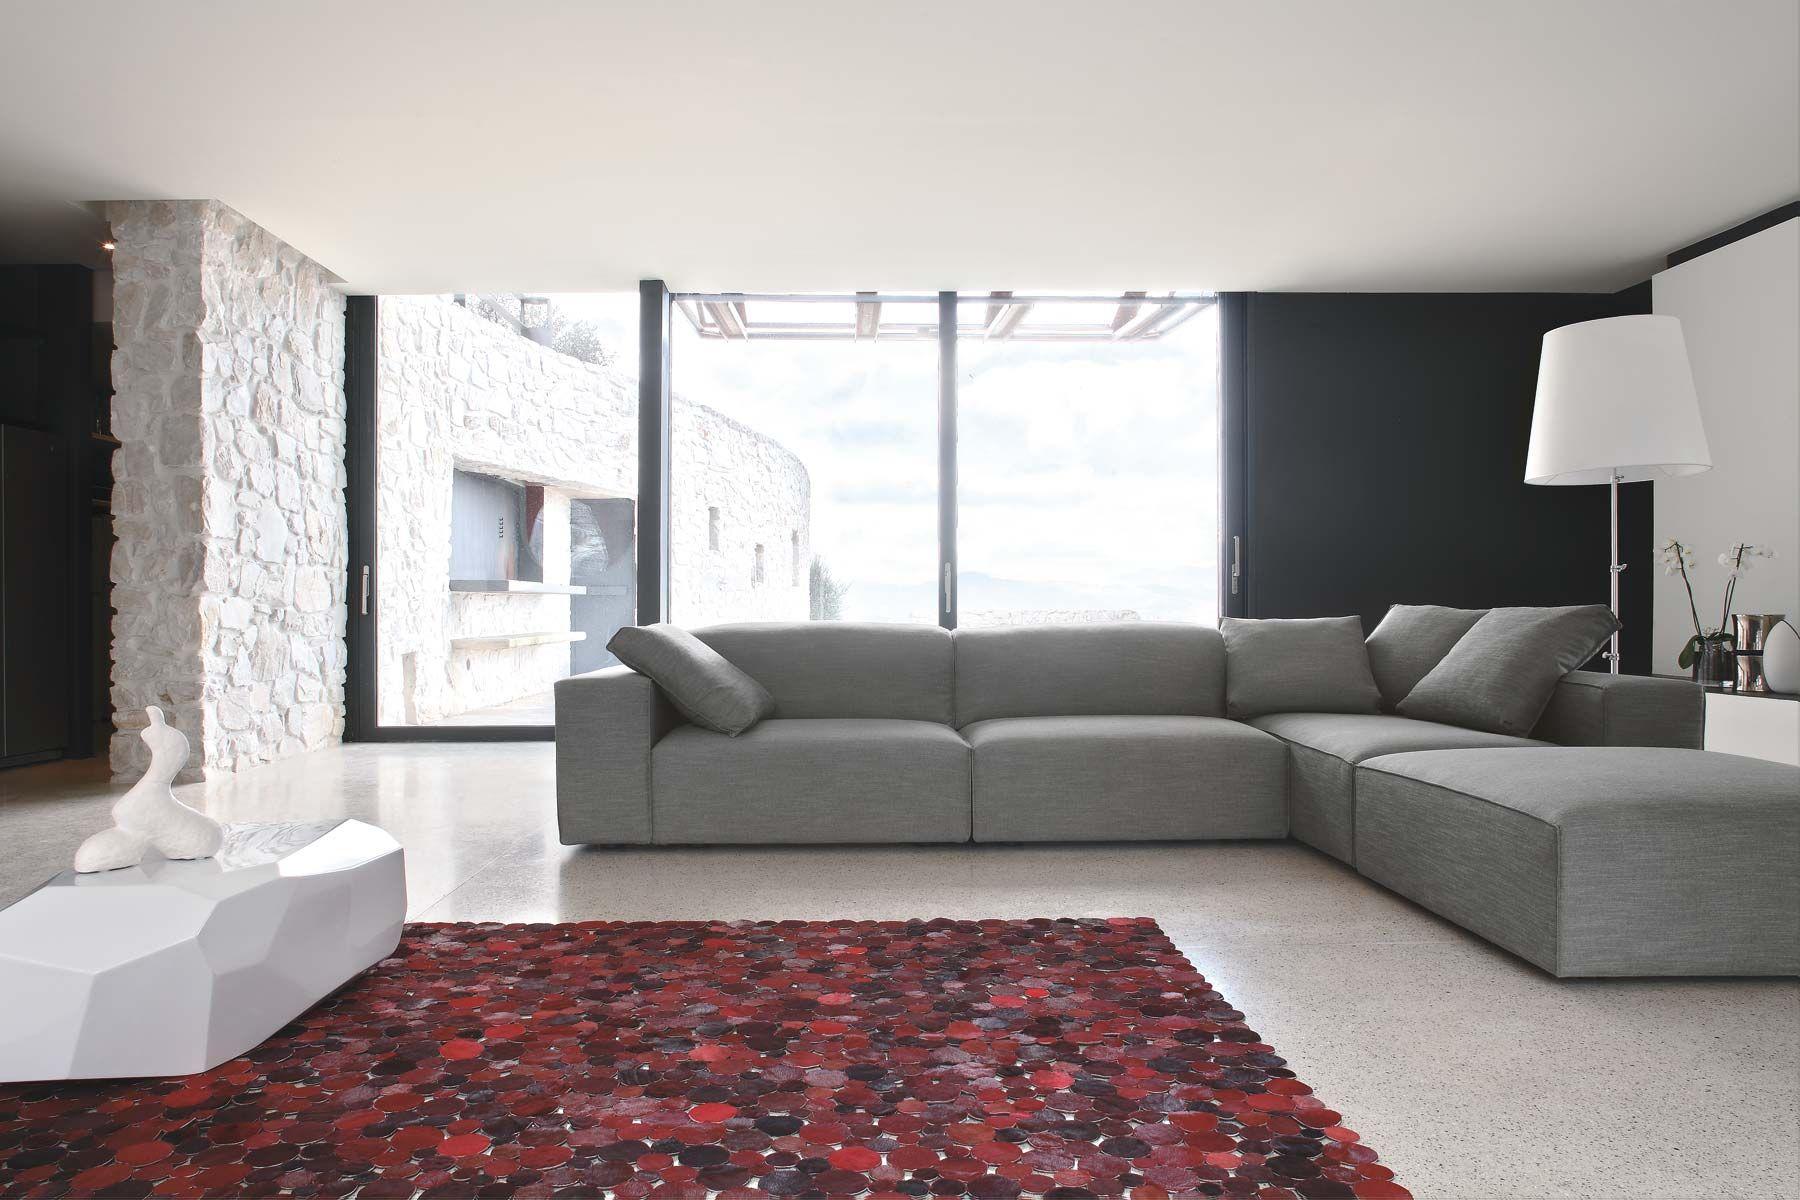 Musa Spa Divani E Poltrone Sofas And Armchairs Doughy